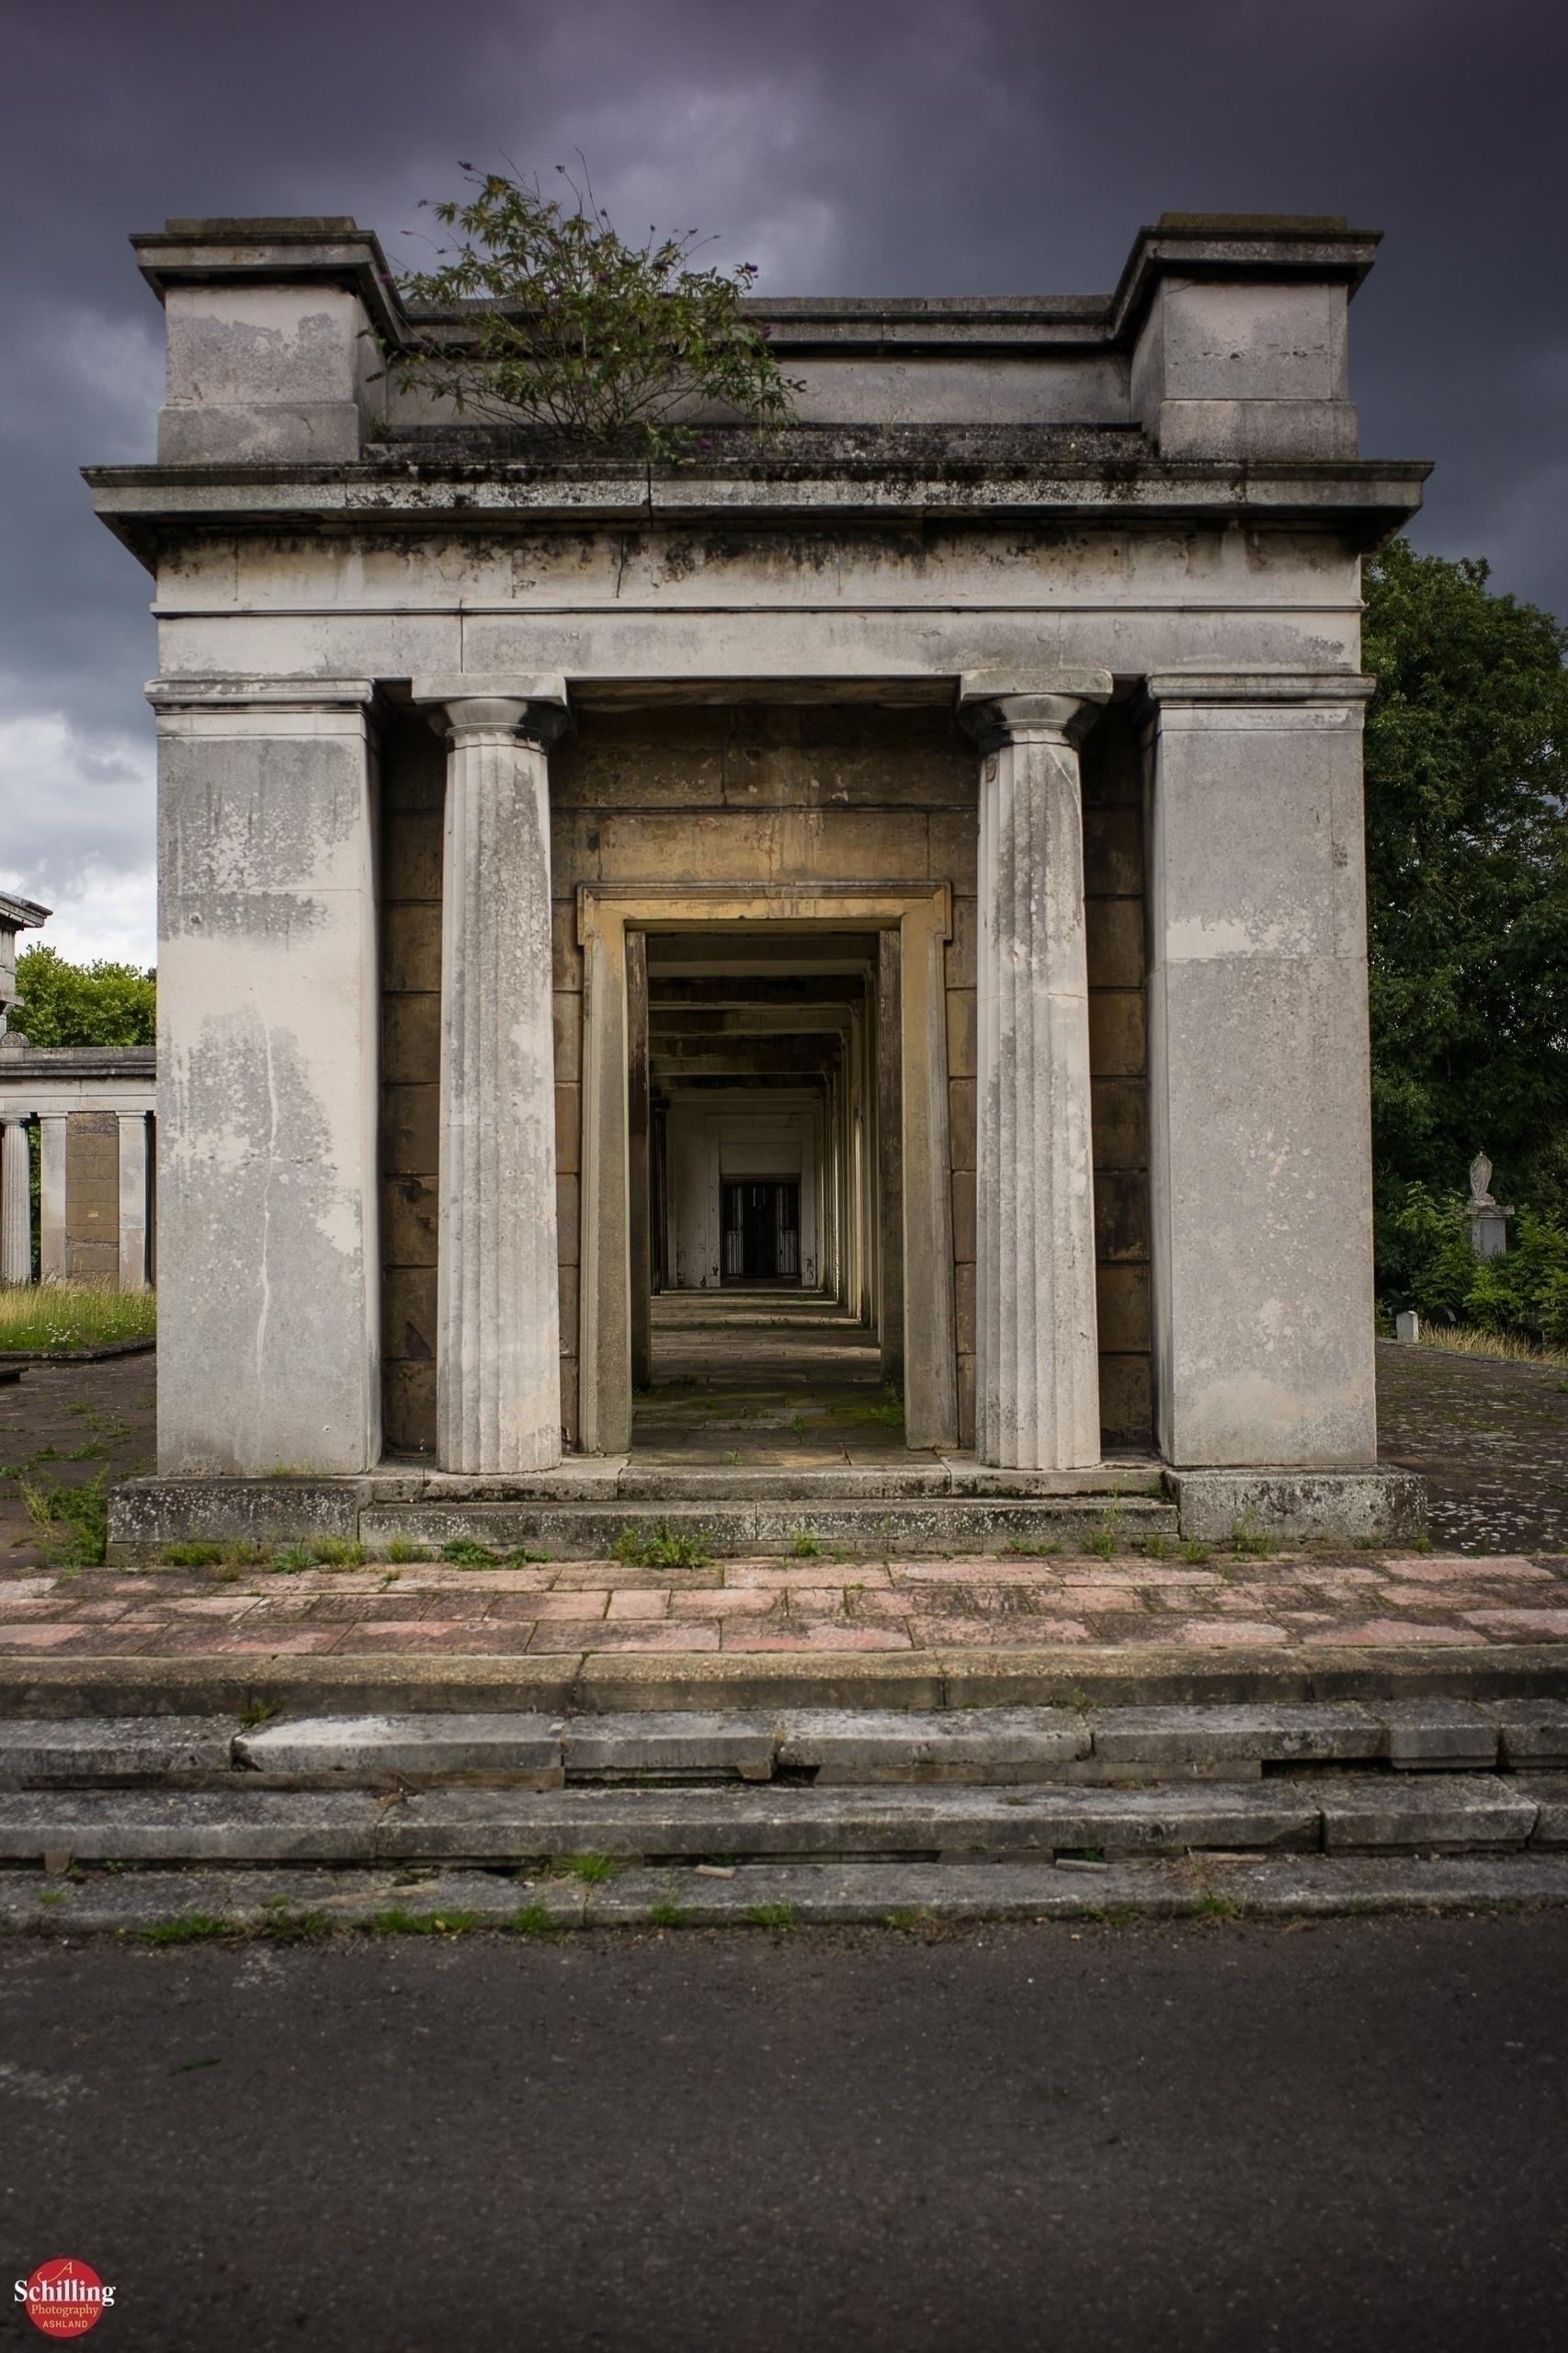 Catacomb Collonade; Kensal Gree - augustschilling | ello